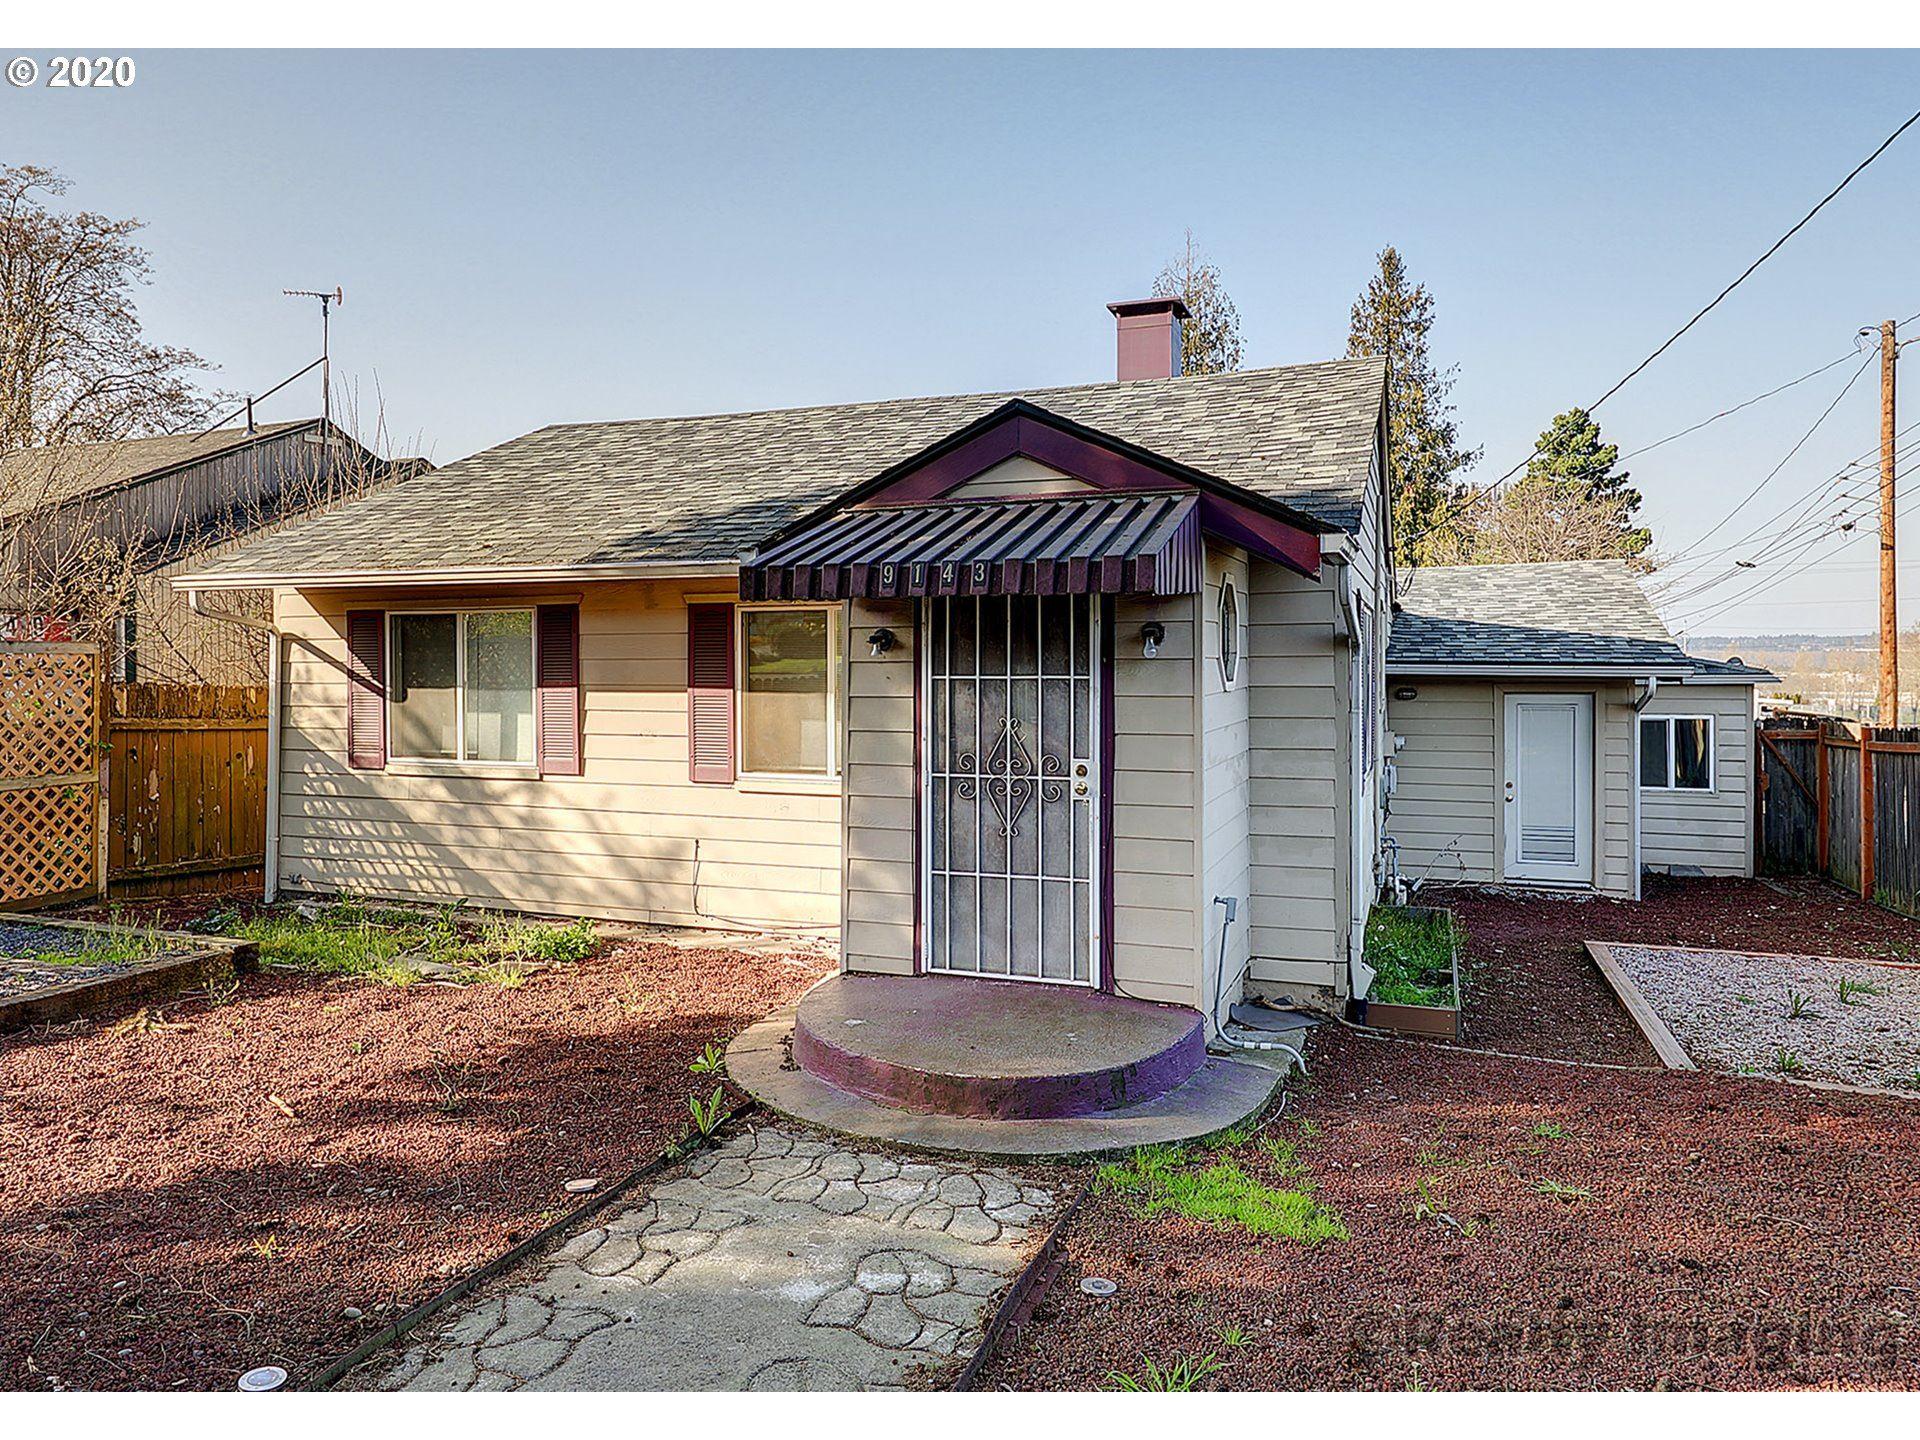 9143 NE PRESCOTT ST, Portland, OR 97220 - MLS#: 20415541